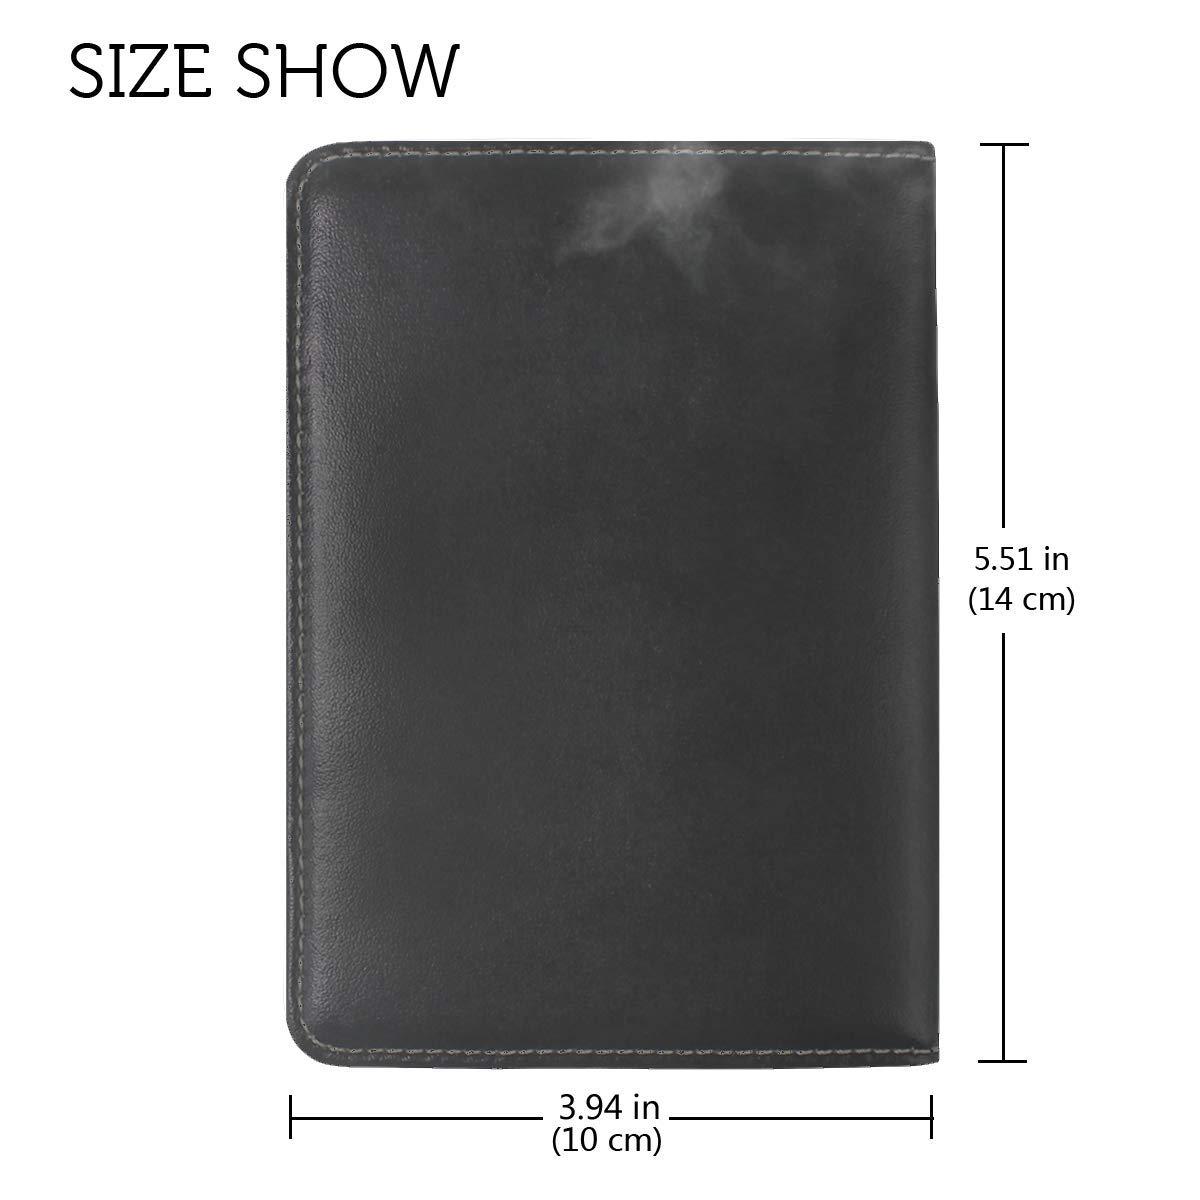 Plane Bw Sky Leather Passport Holder Cover Case Travel One Pocket